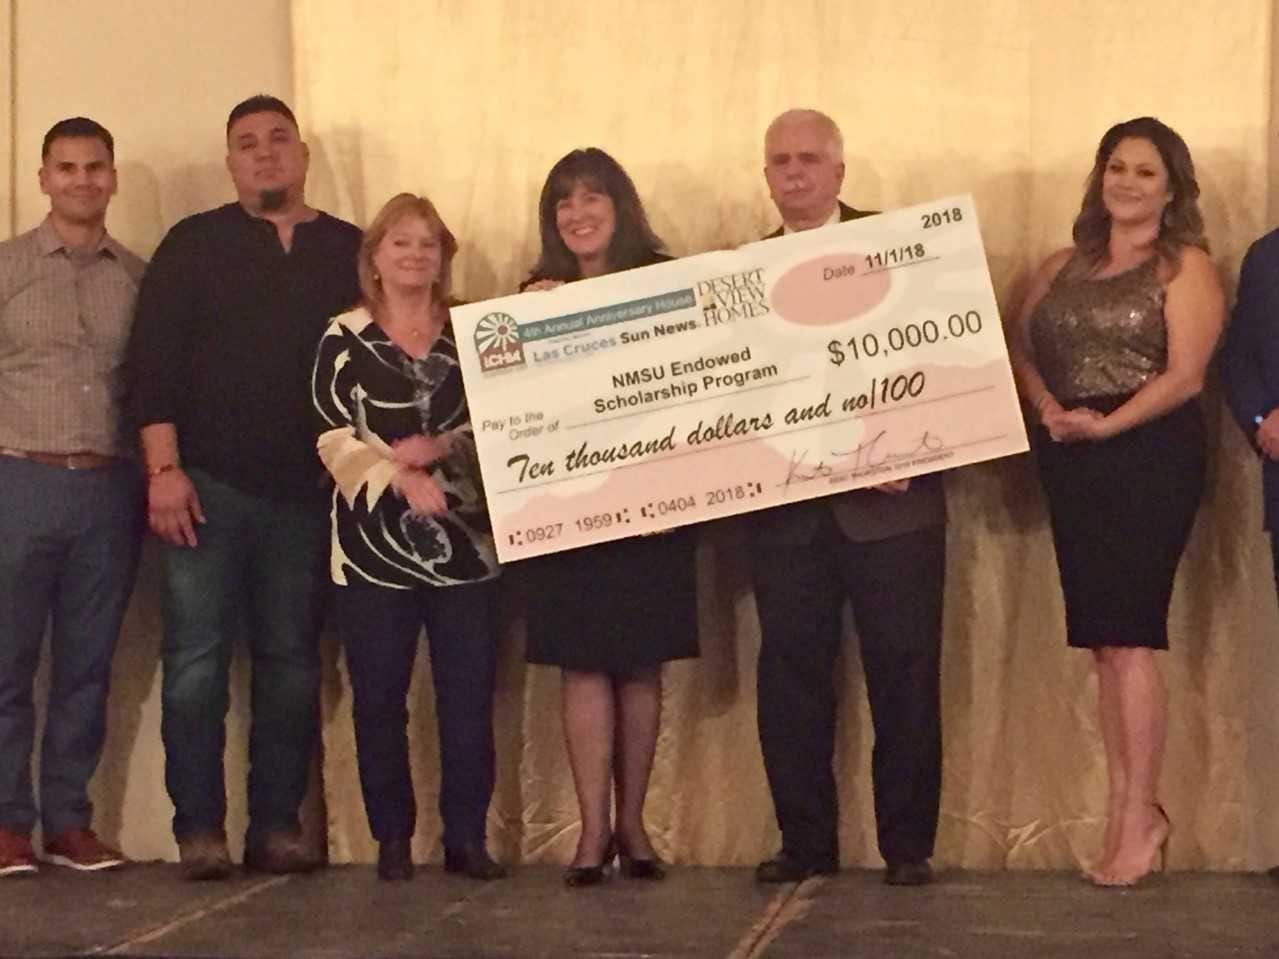 NMSU Endowed Scholarship program, $10,000